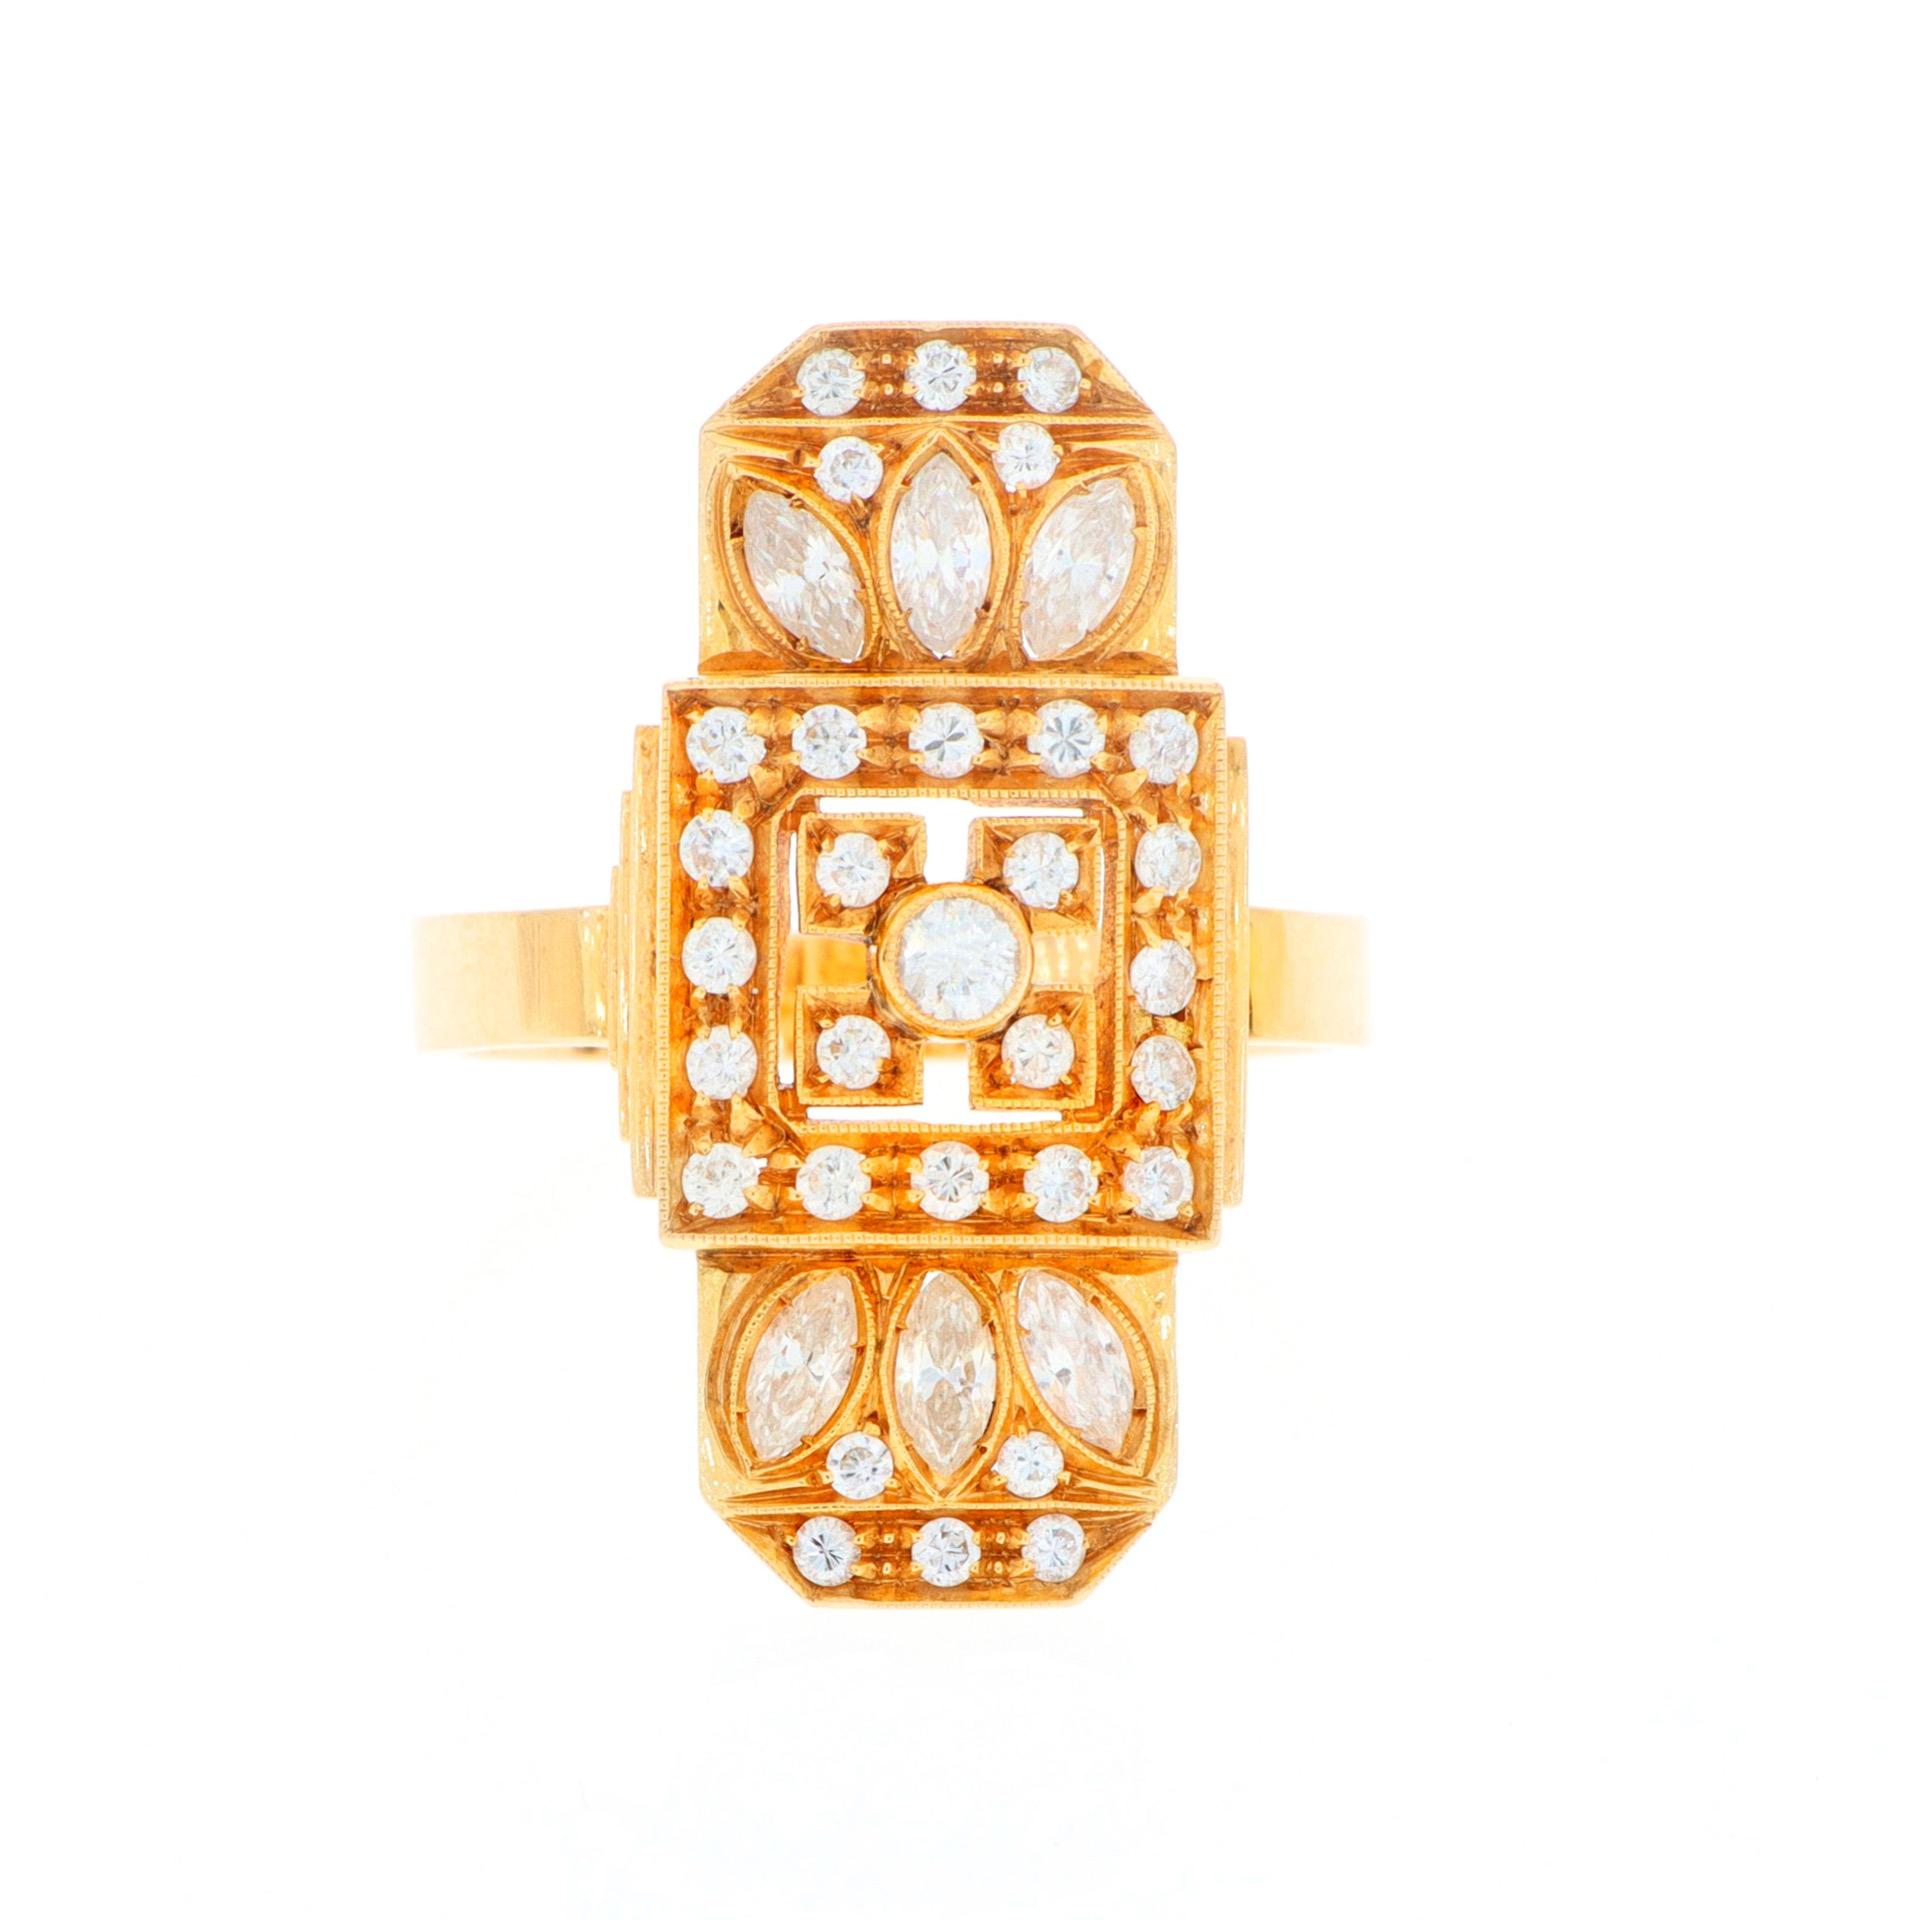 thumb2|Anello in oro giallo con diamanti